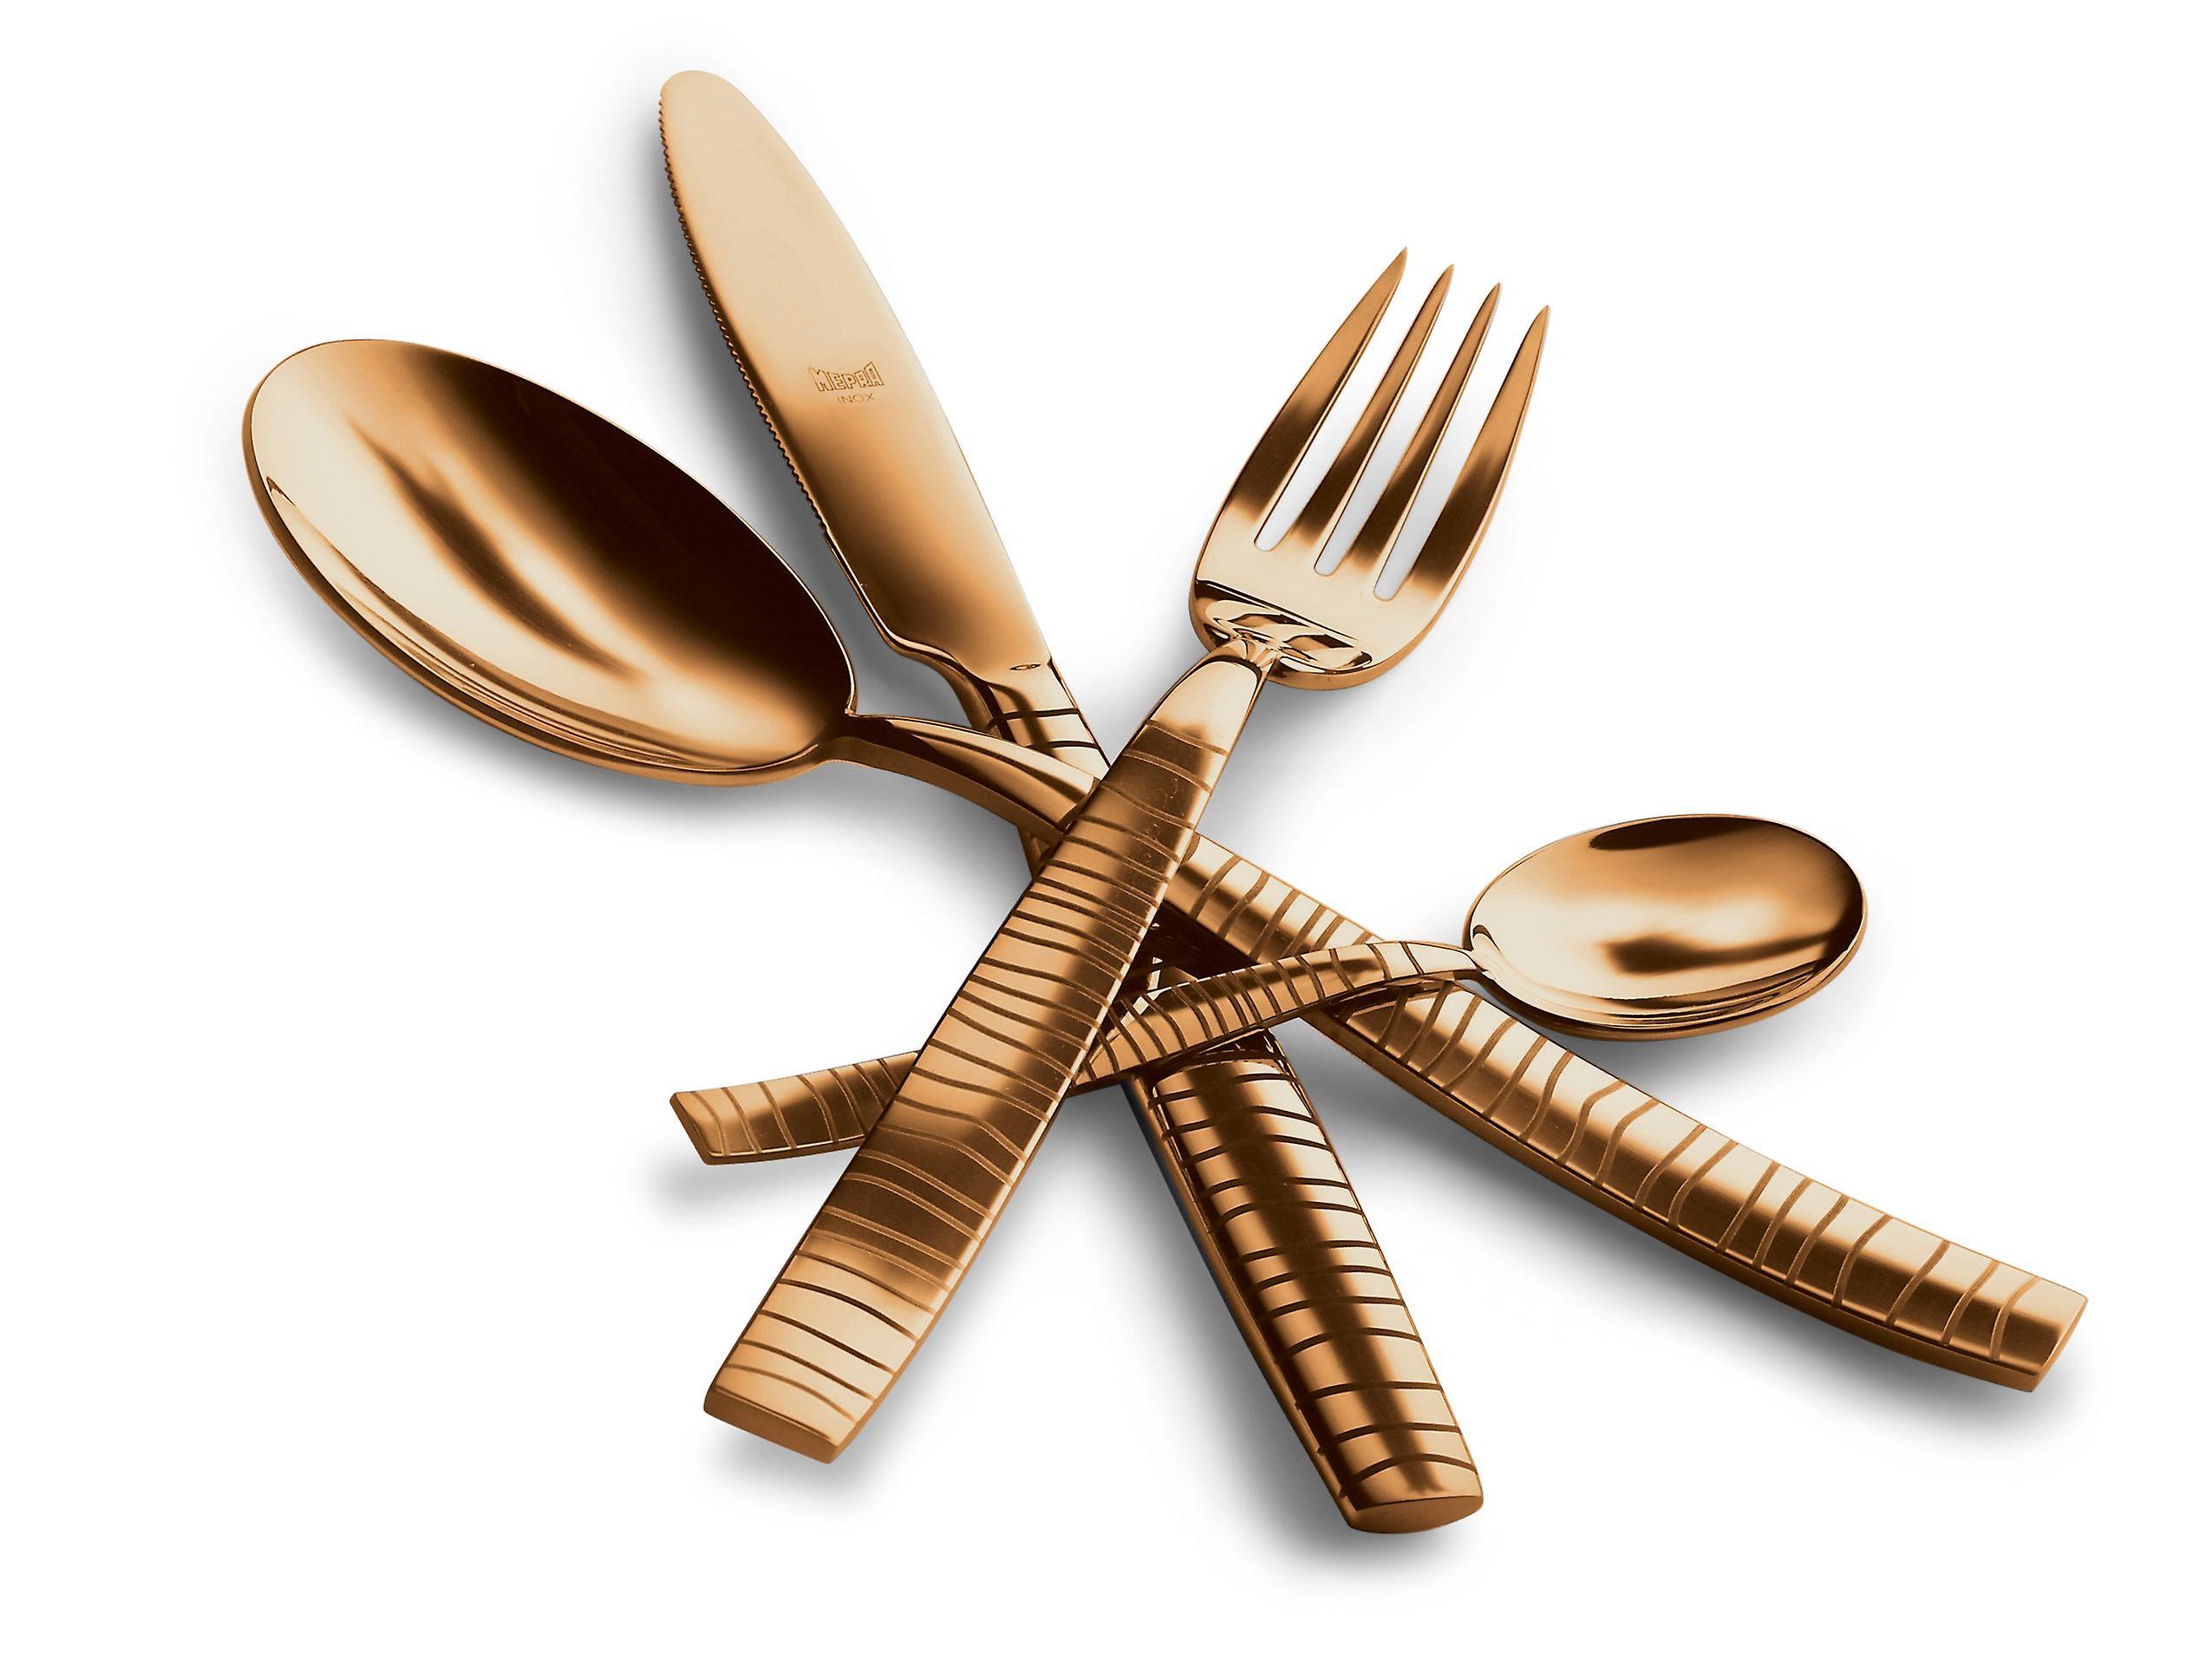 Mepra Tigre Oro 5 pcs flatware set